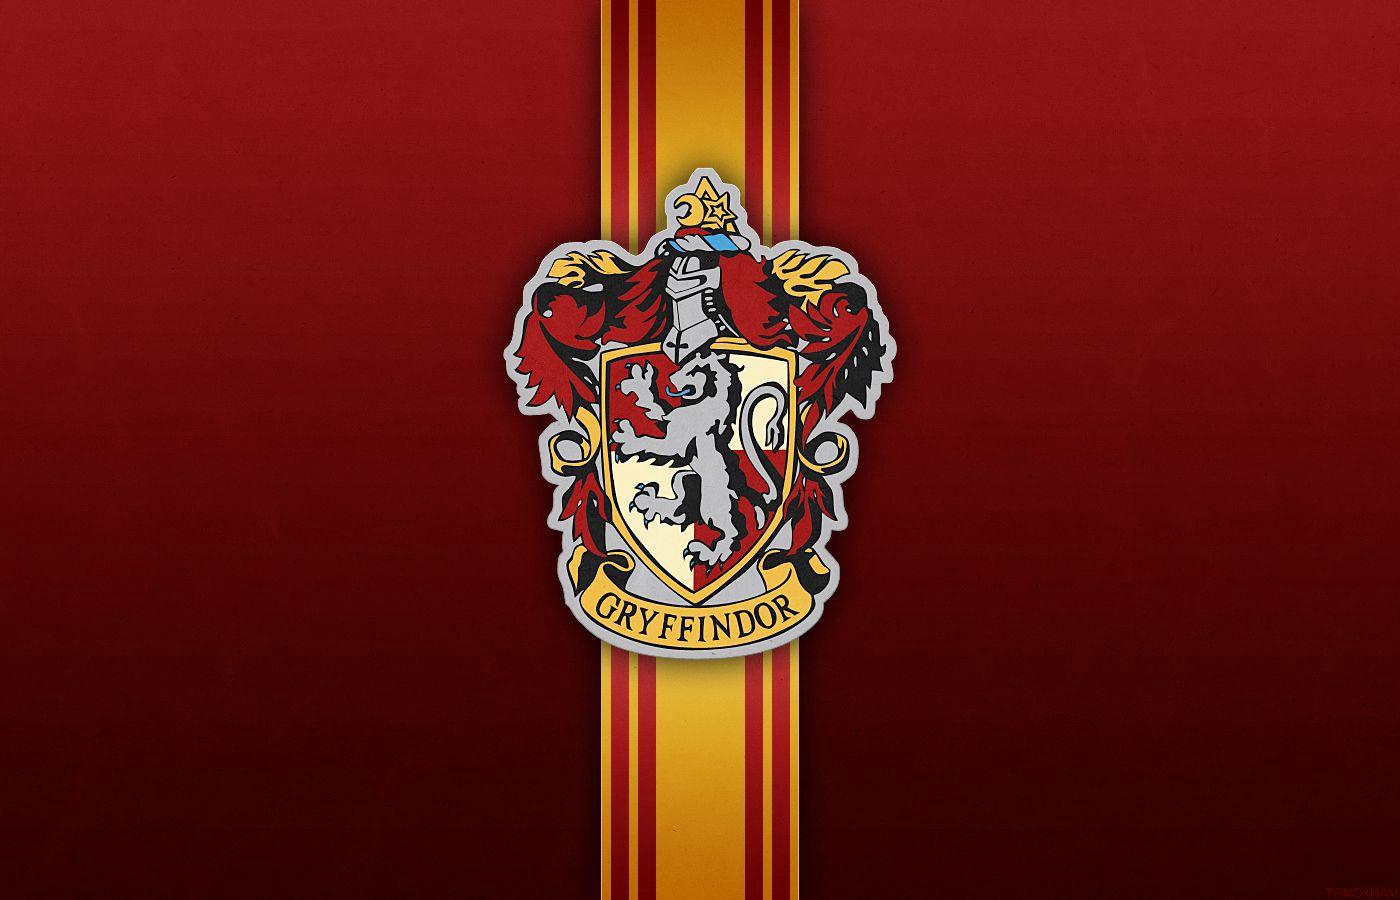 Harry Potter Wallpaper Gryffindor Hd ...